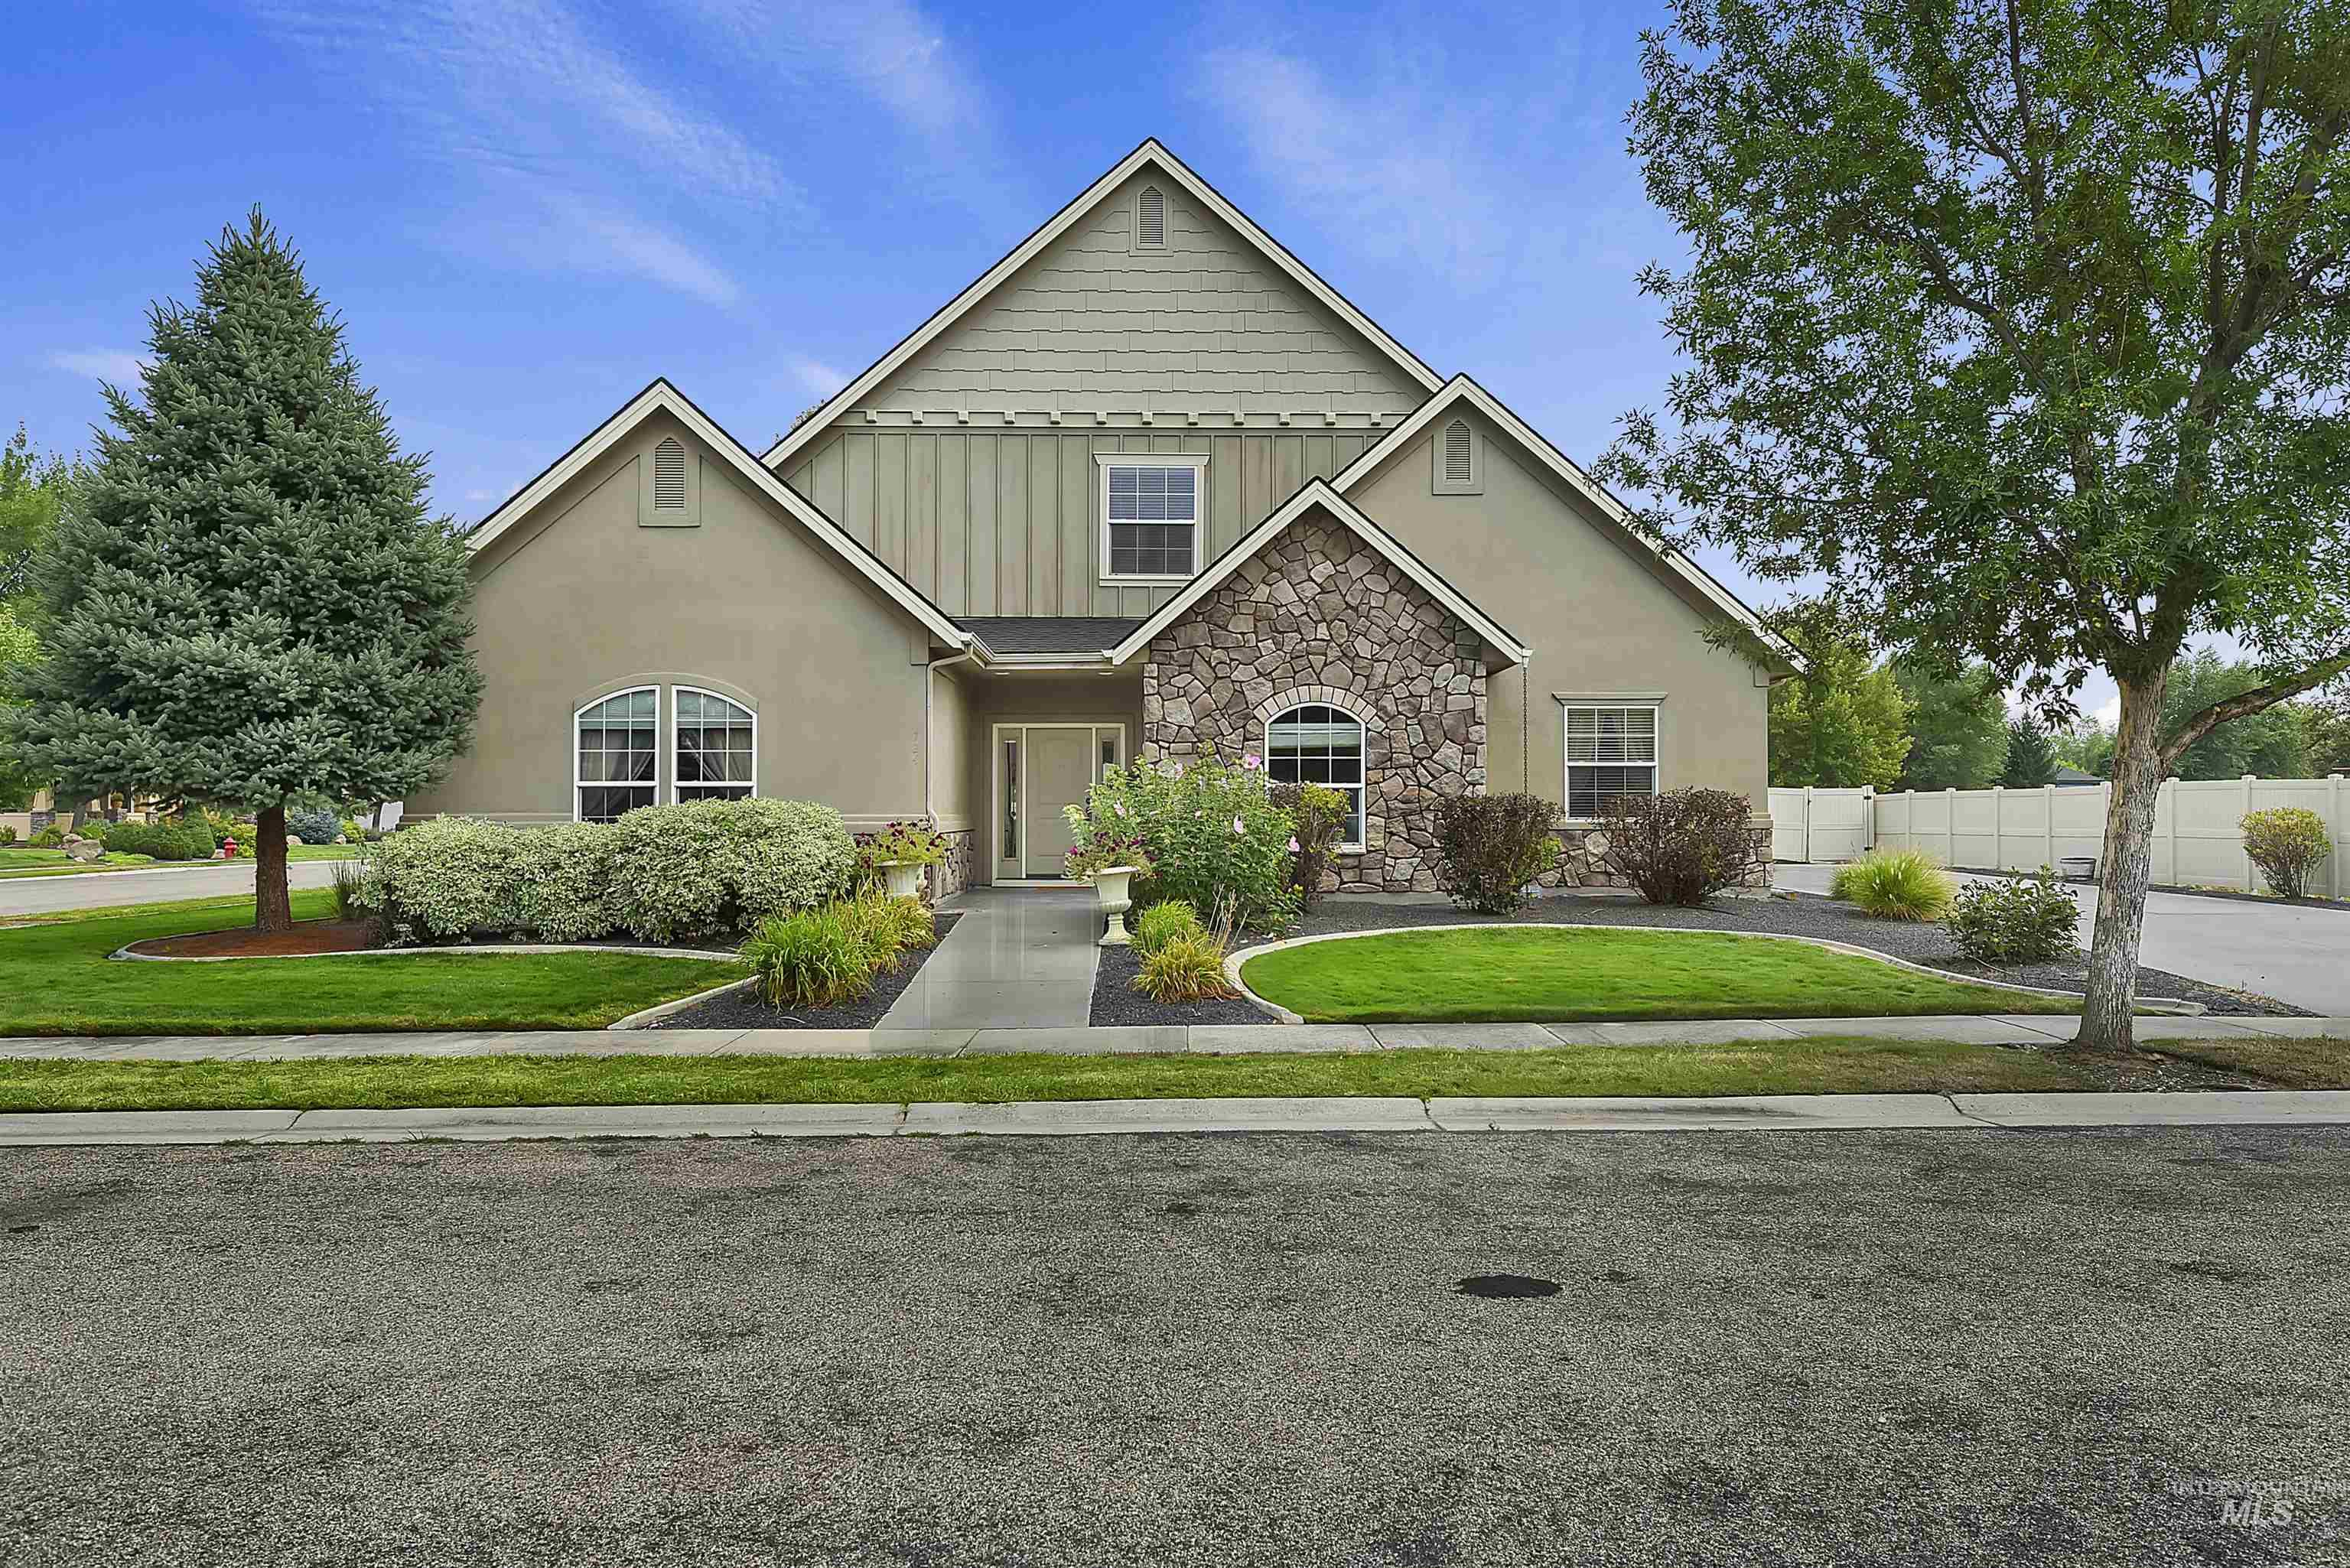 724 N Cactus Creek Ave, Eagle, ID 83616